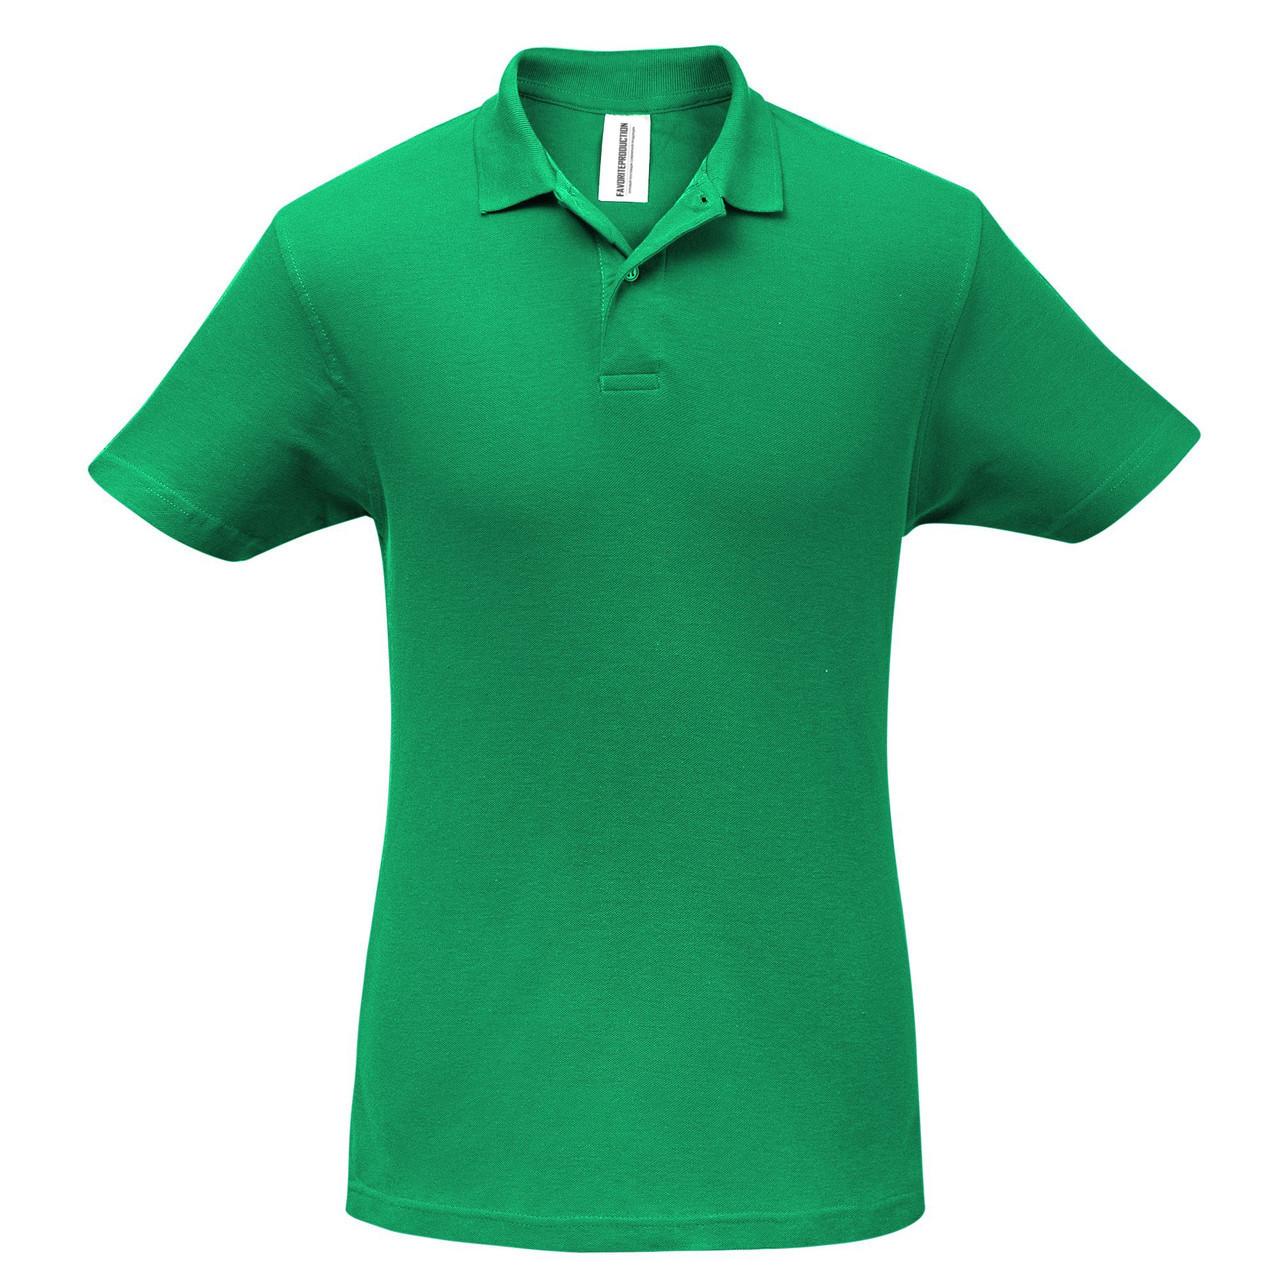 Футболка Поло Зеленая.200 гр.M